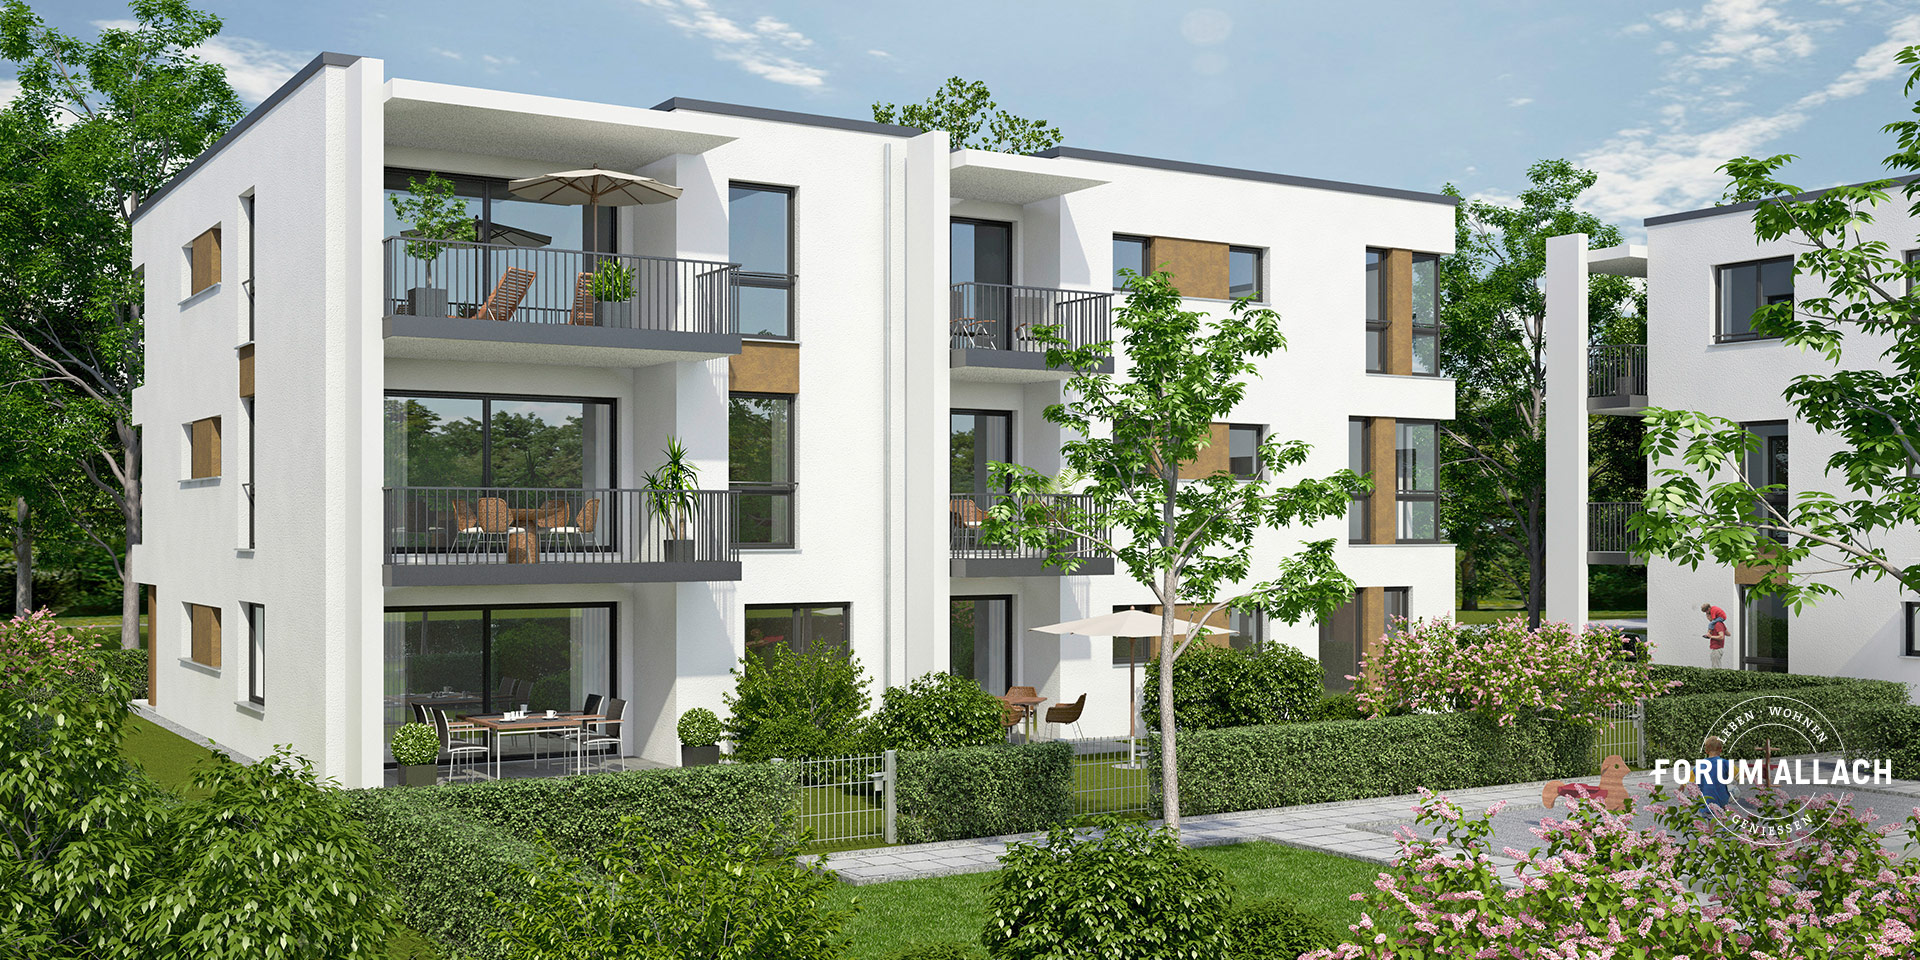 Property Munich: Forum Allach